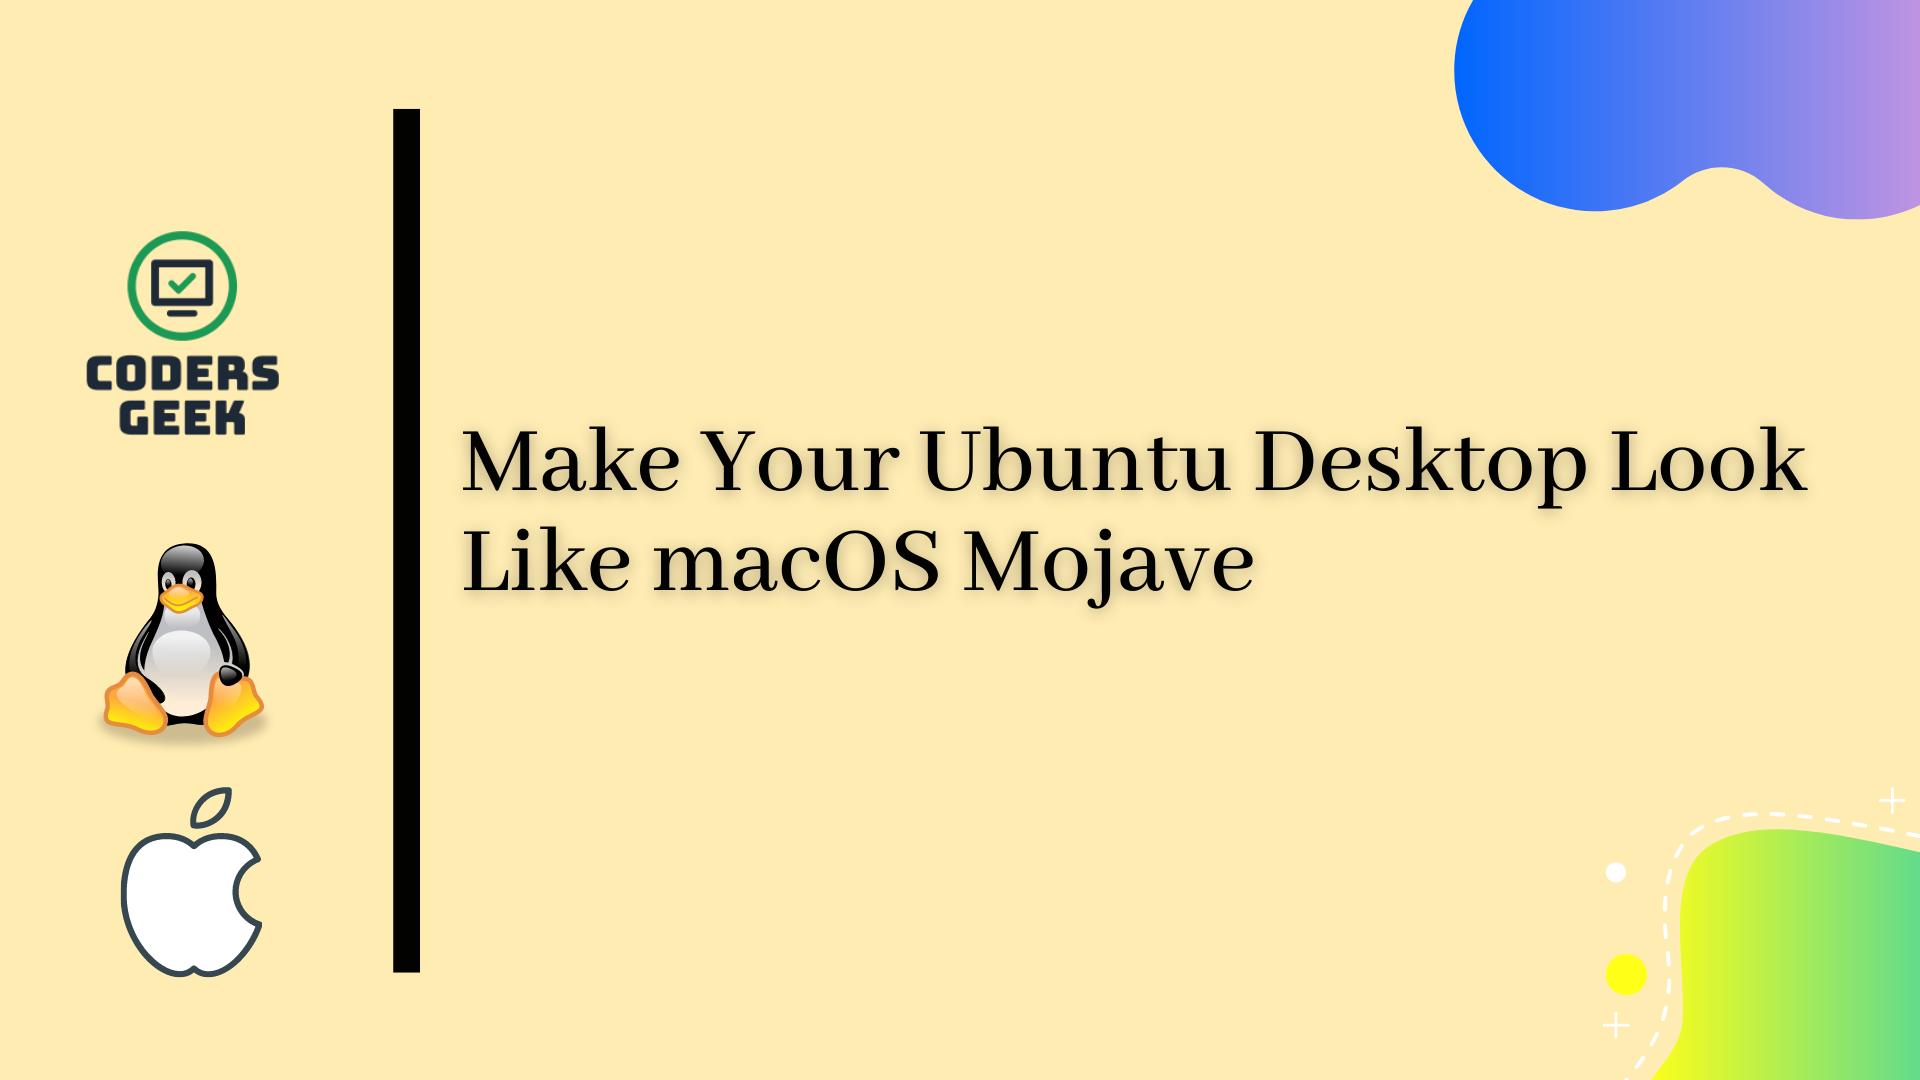 Make Your Ubuntu Desktop Look Like macOS Mojave